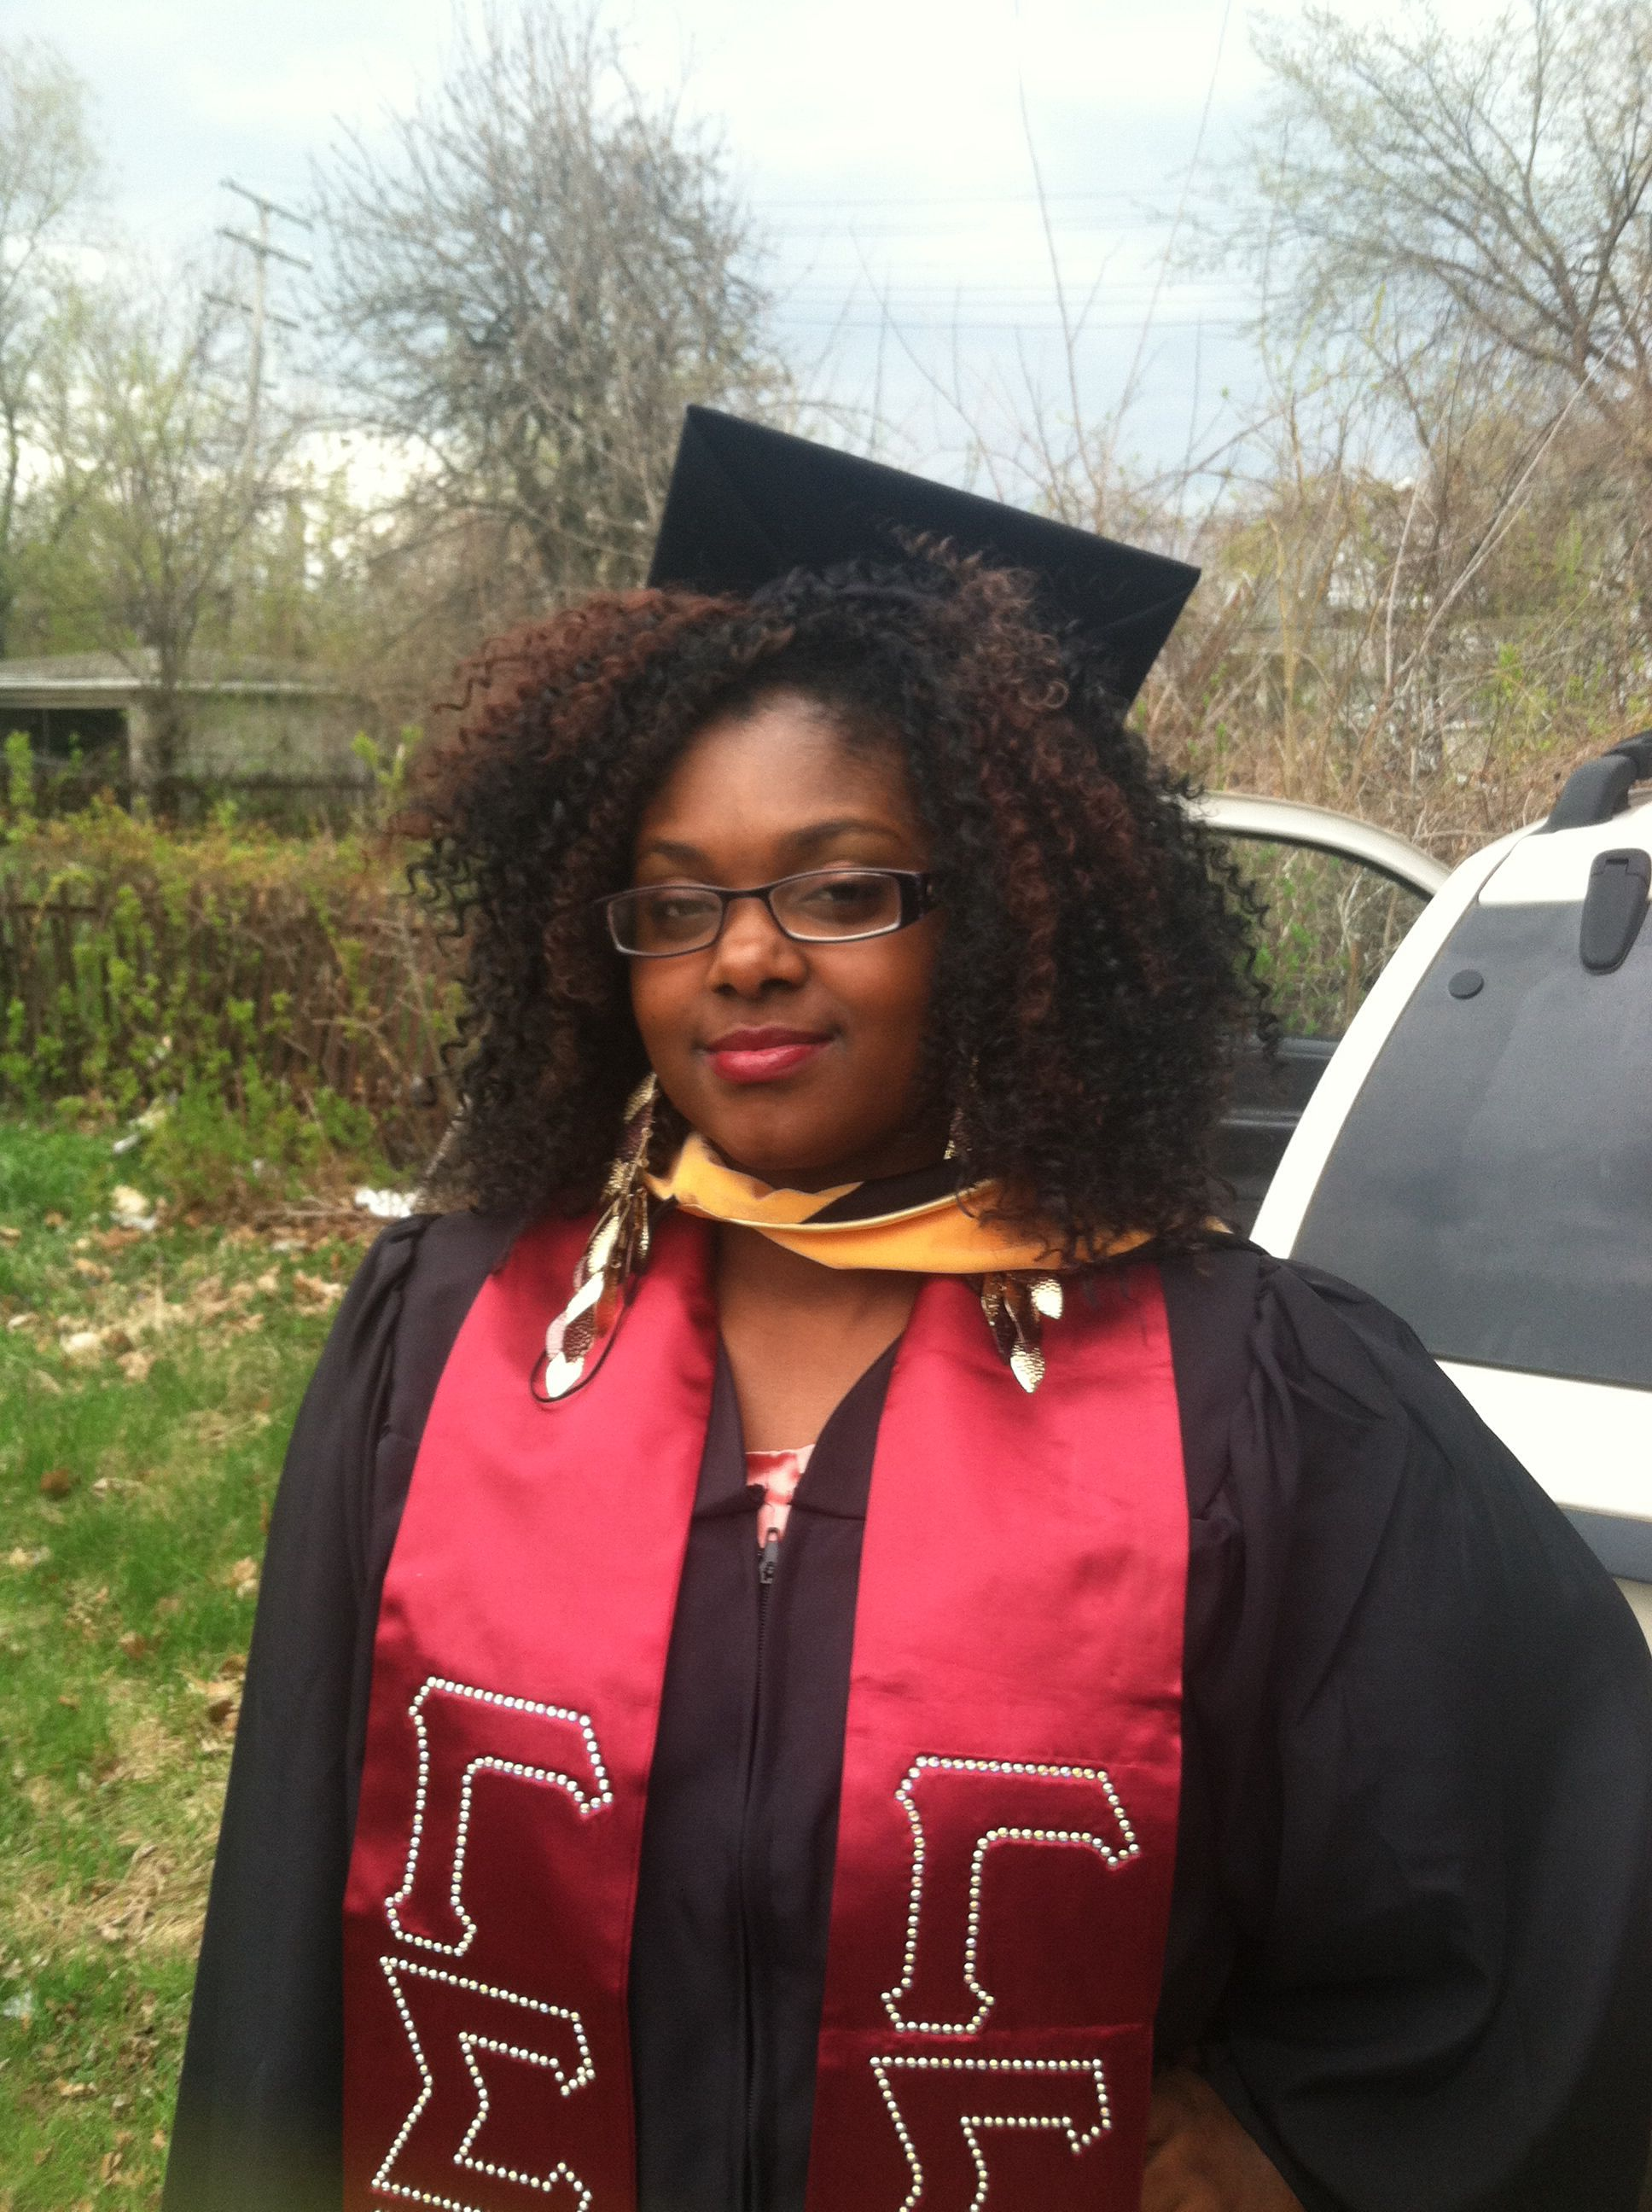 graduation cap and crochet braids